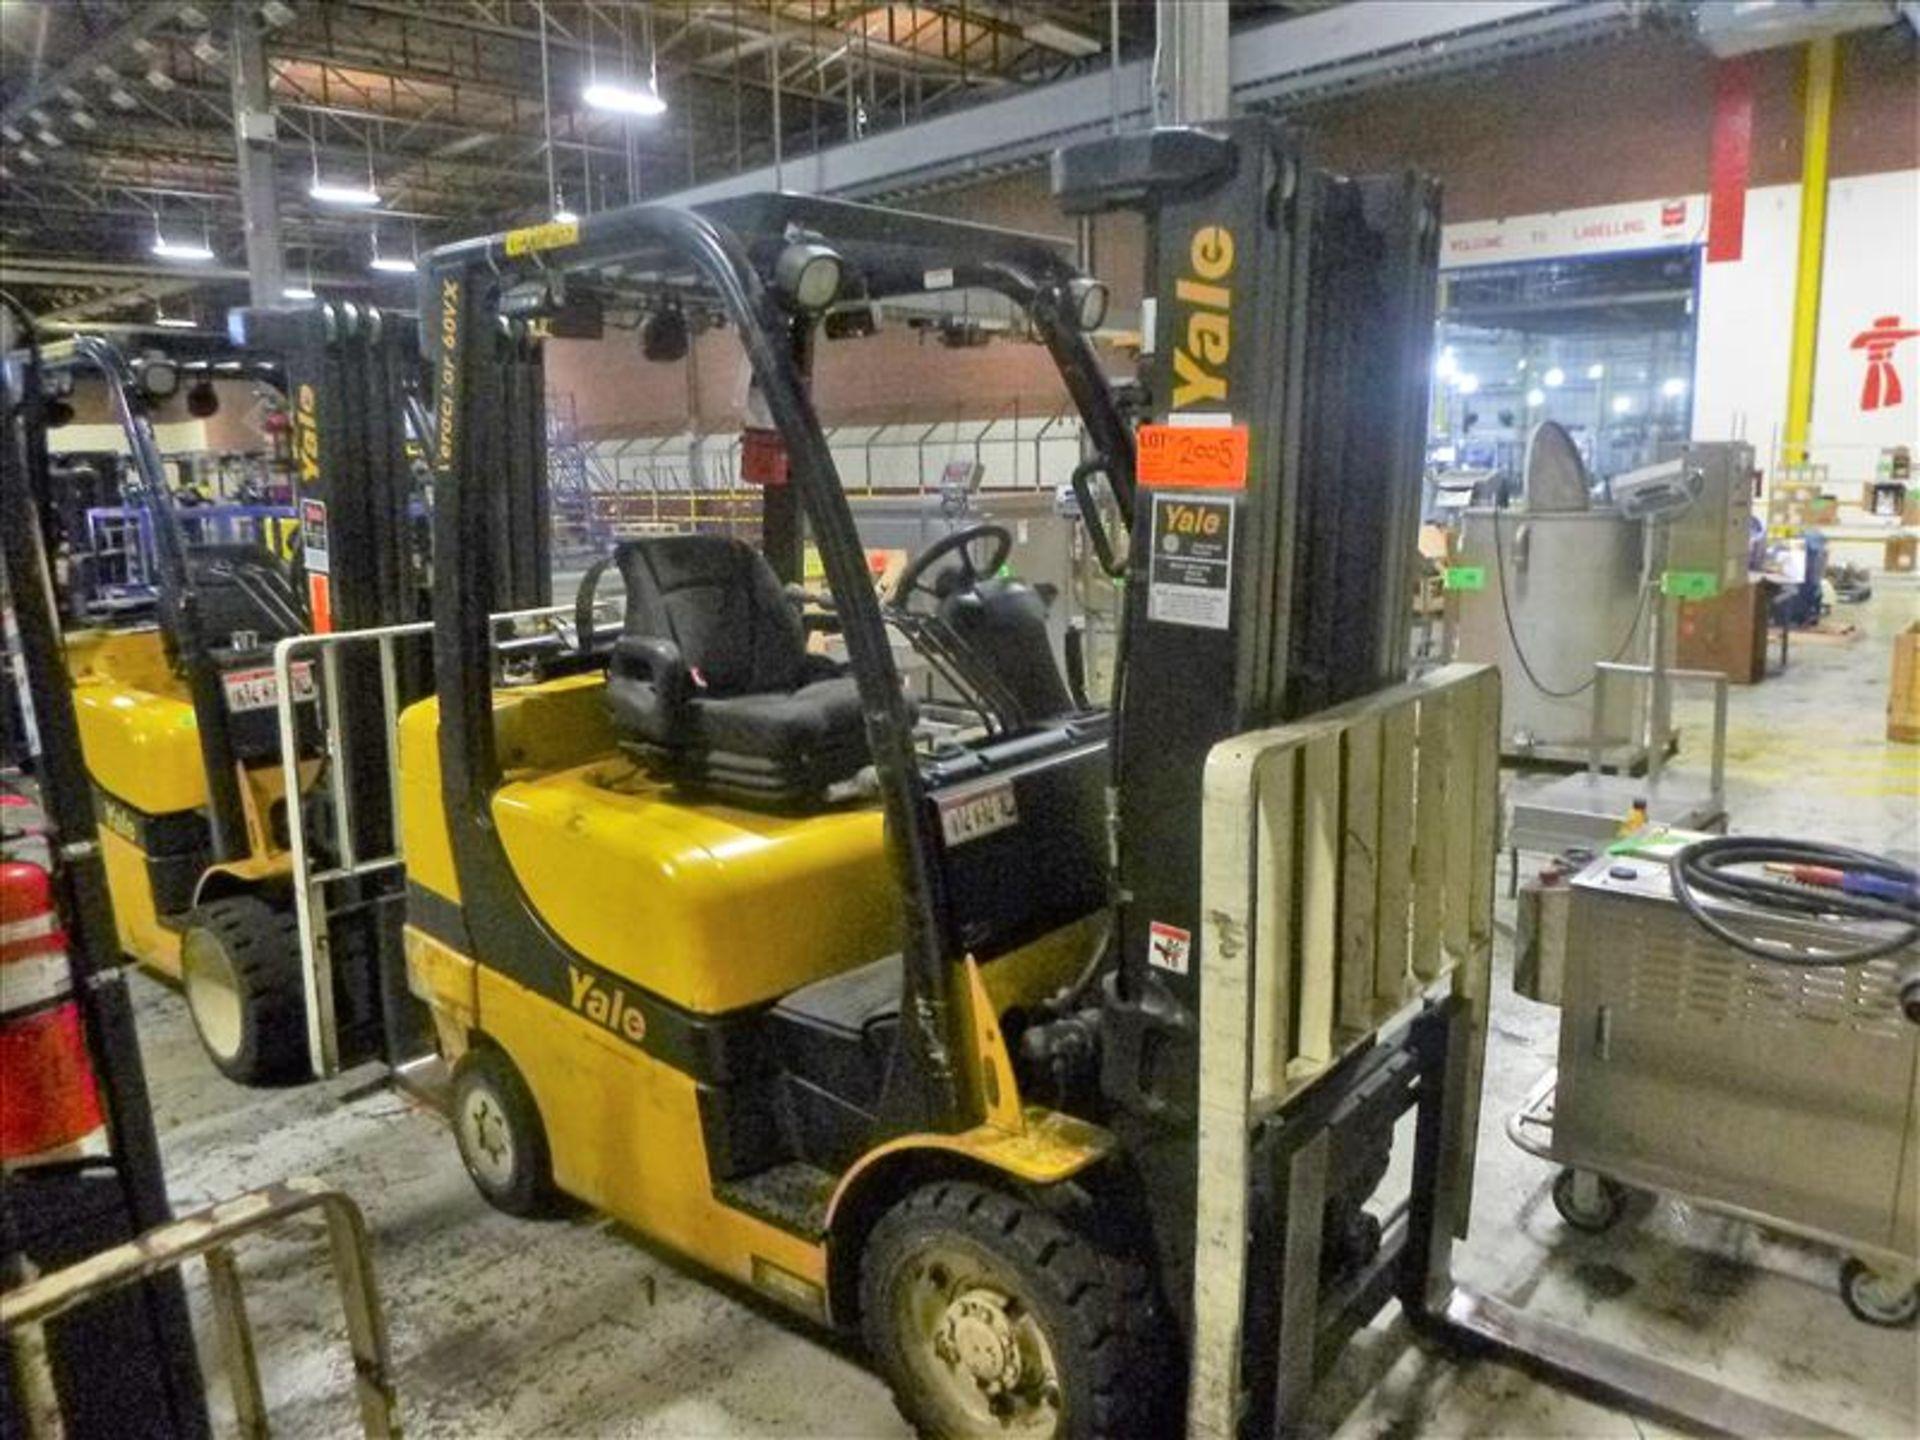 Yale fork lift truck, mod. GLC060VXNSEE085, ser. no. A910V23178L, LPG, 5500 lbs cap., 181 in. lift